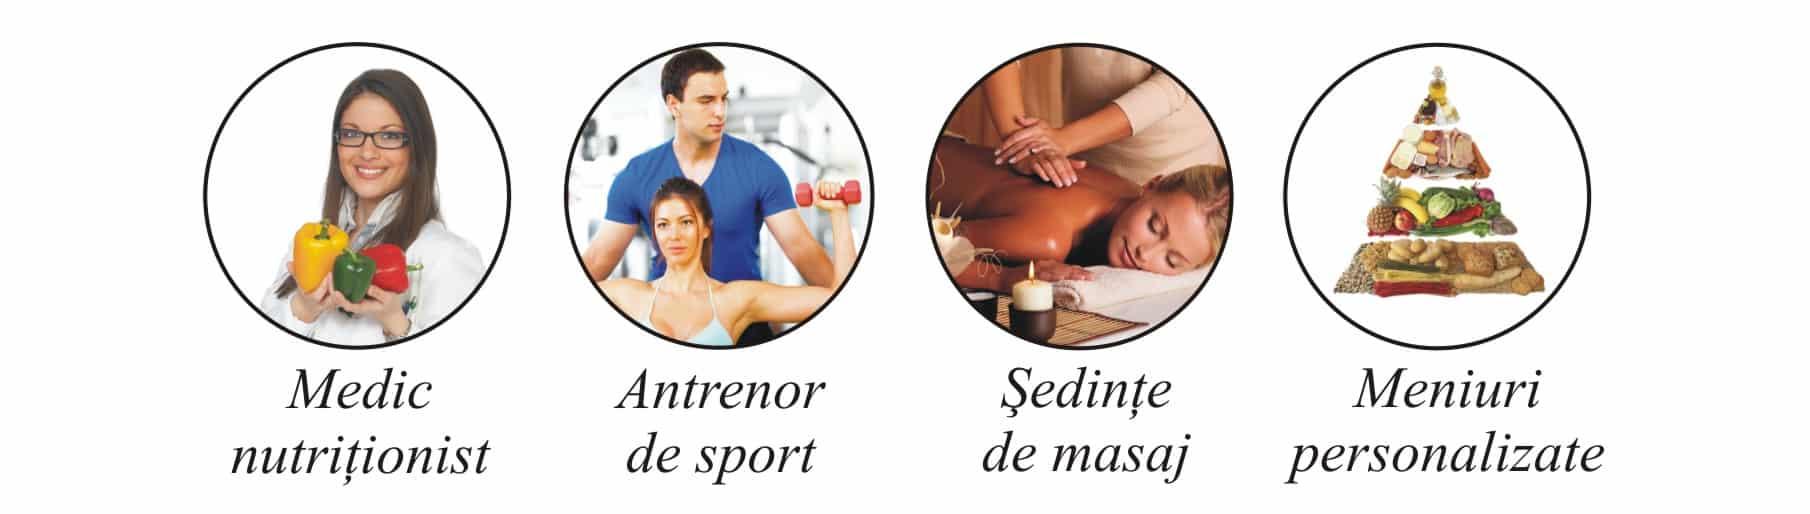 Nutritionist, antrenor de sport, sedinte de masaj si meniuri personalizate la clinica de nutritie Dietalia